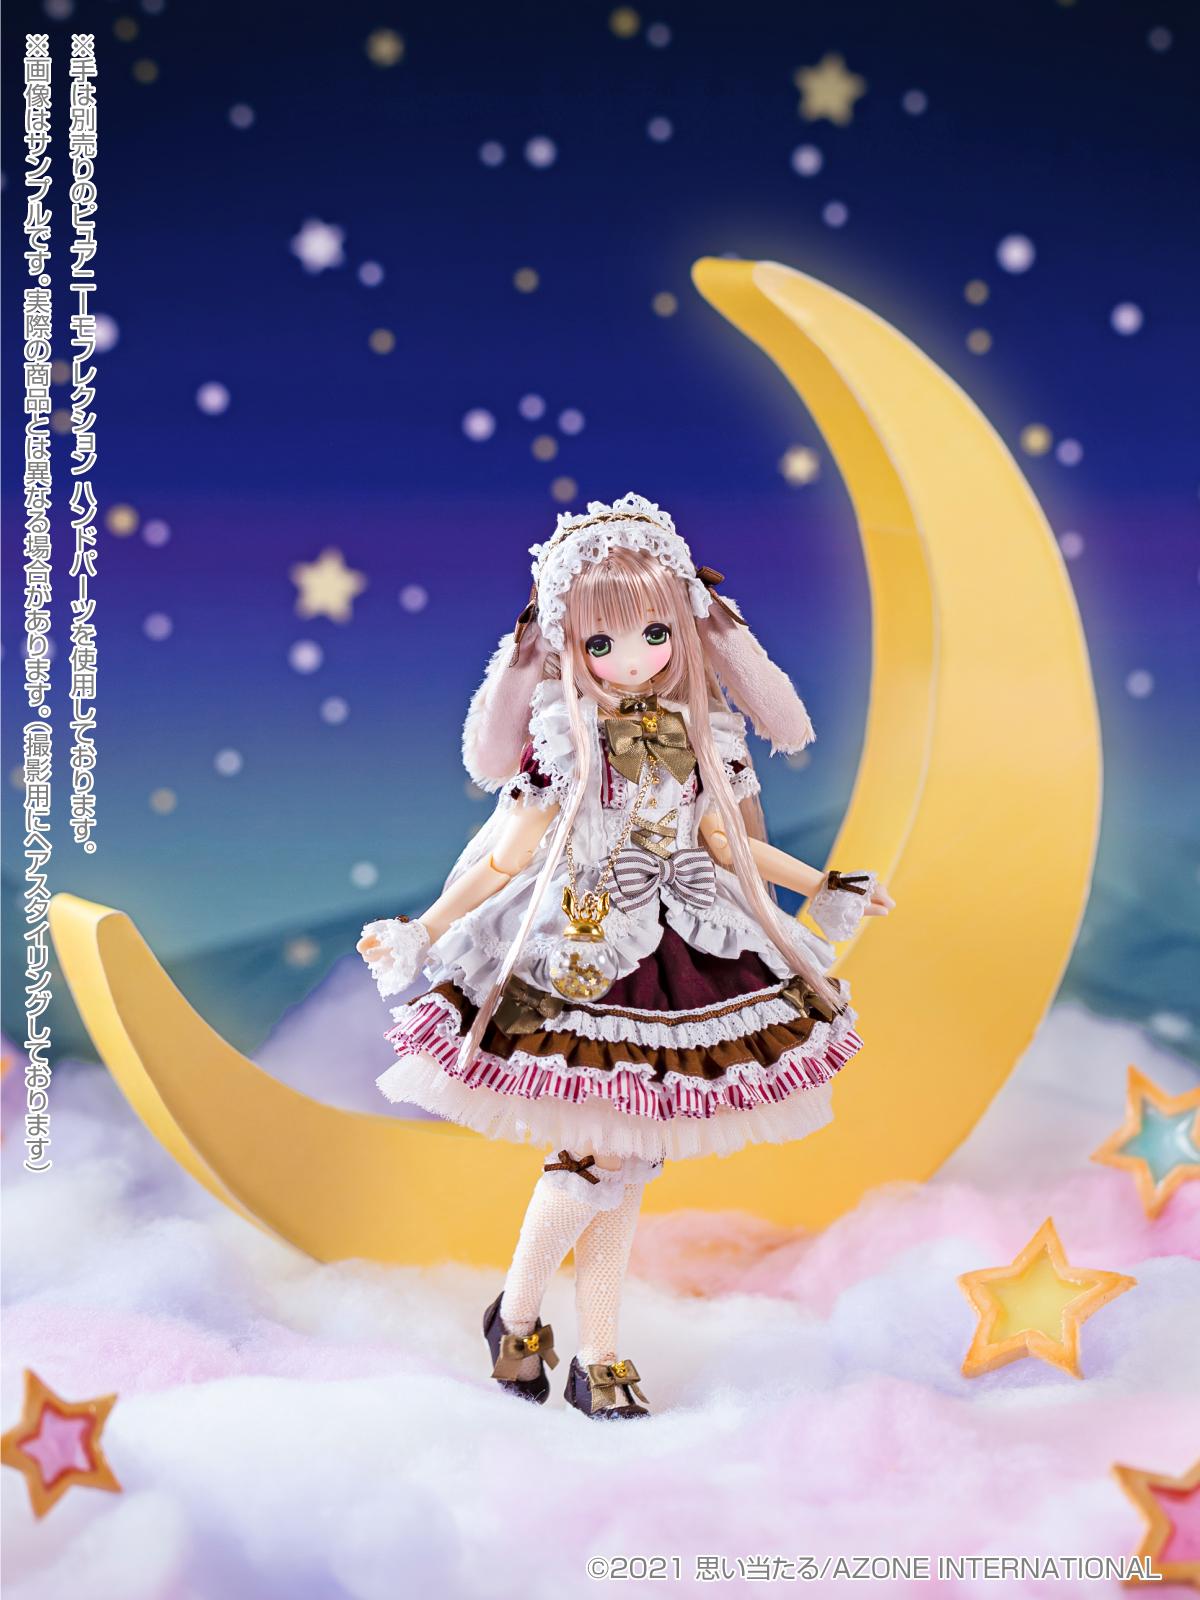 Star Sprinkles『Moon Rabbit Miu/ムーンラビット 月兎 みう』えっくす☆きゅーと 1/6 完成品ドール-002